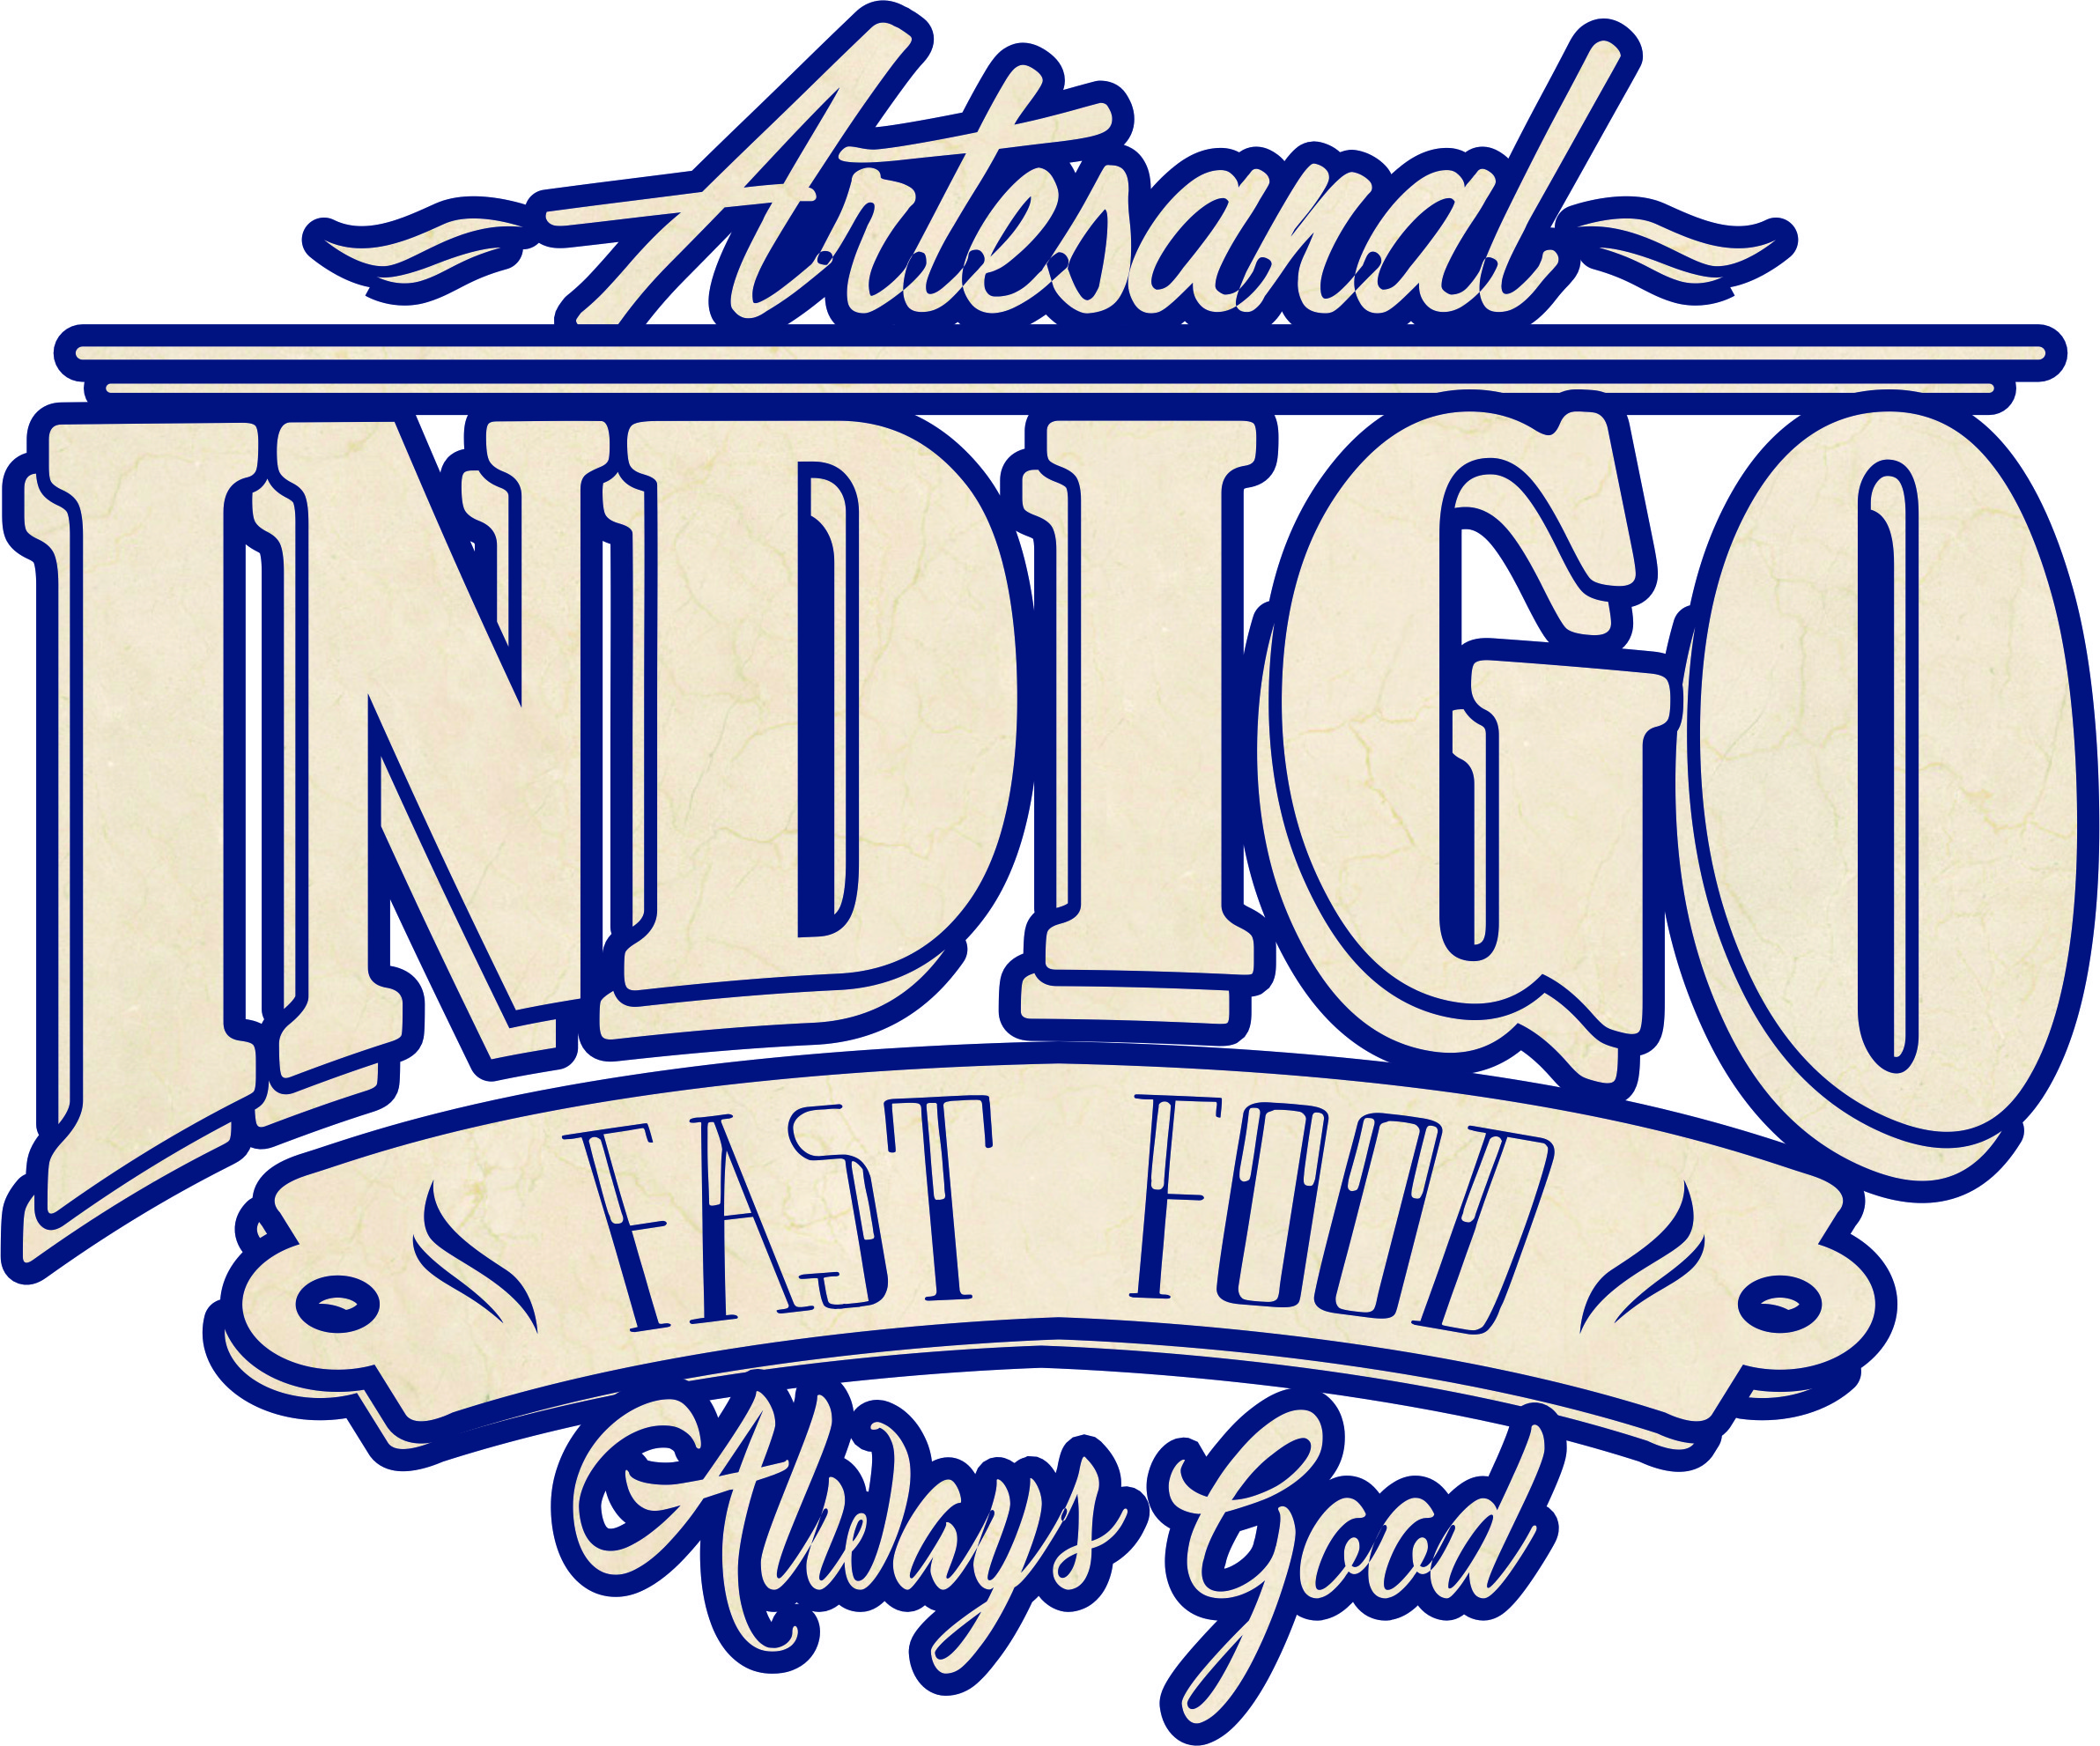 Indigo Fast Food Modelia (Logística)